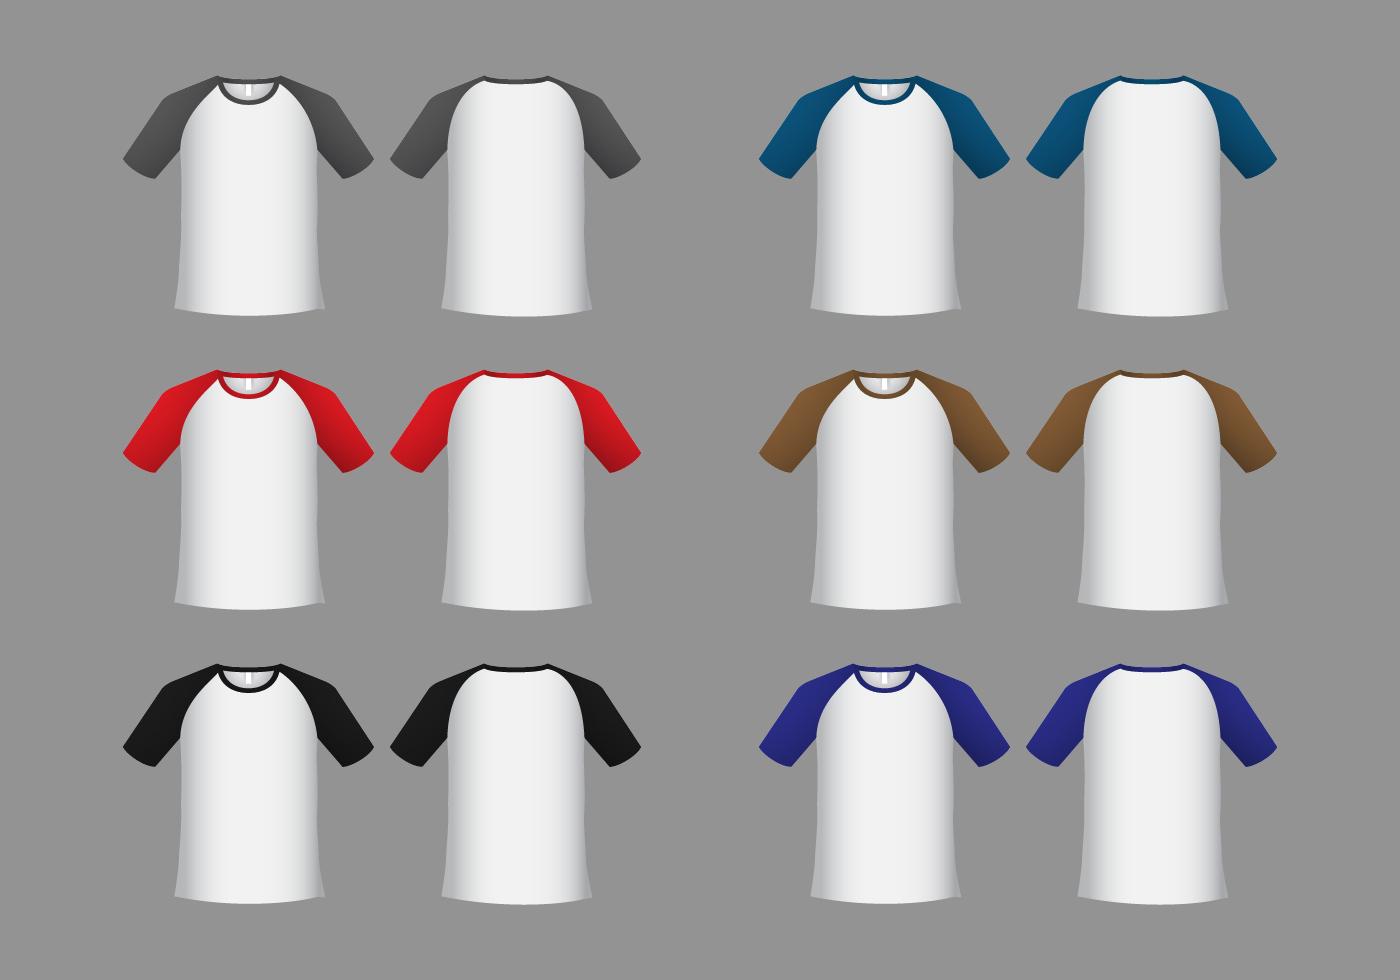 100 custom t shirt templates custom jackets at cjackets com